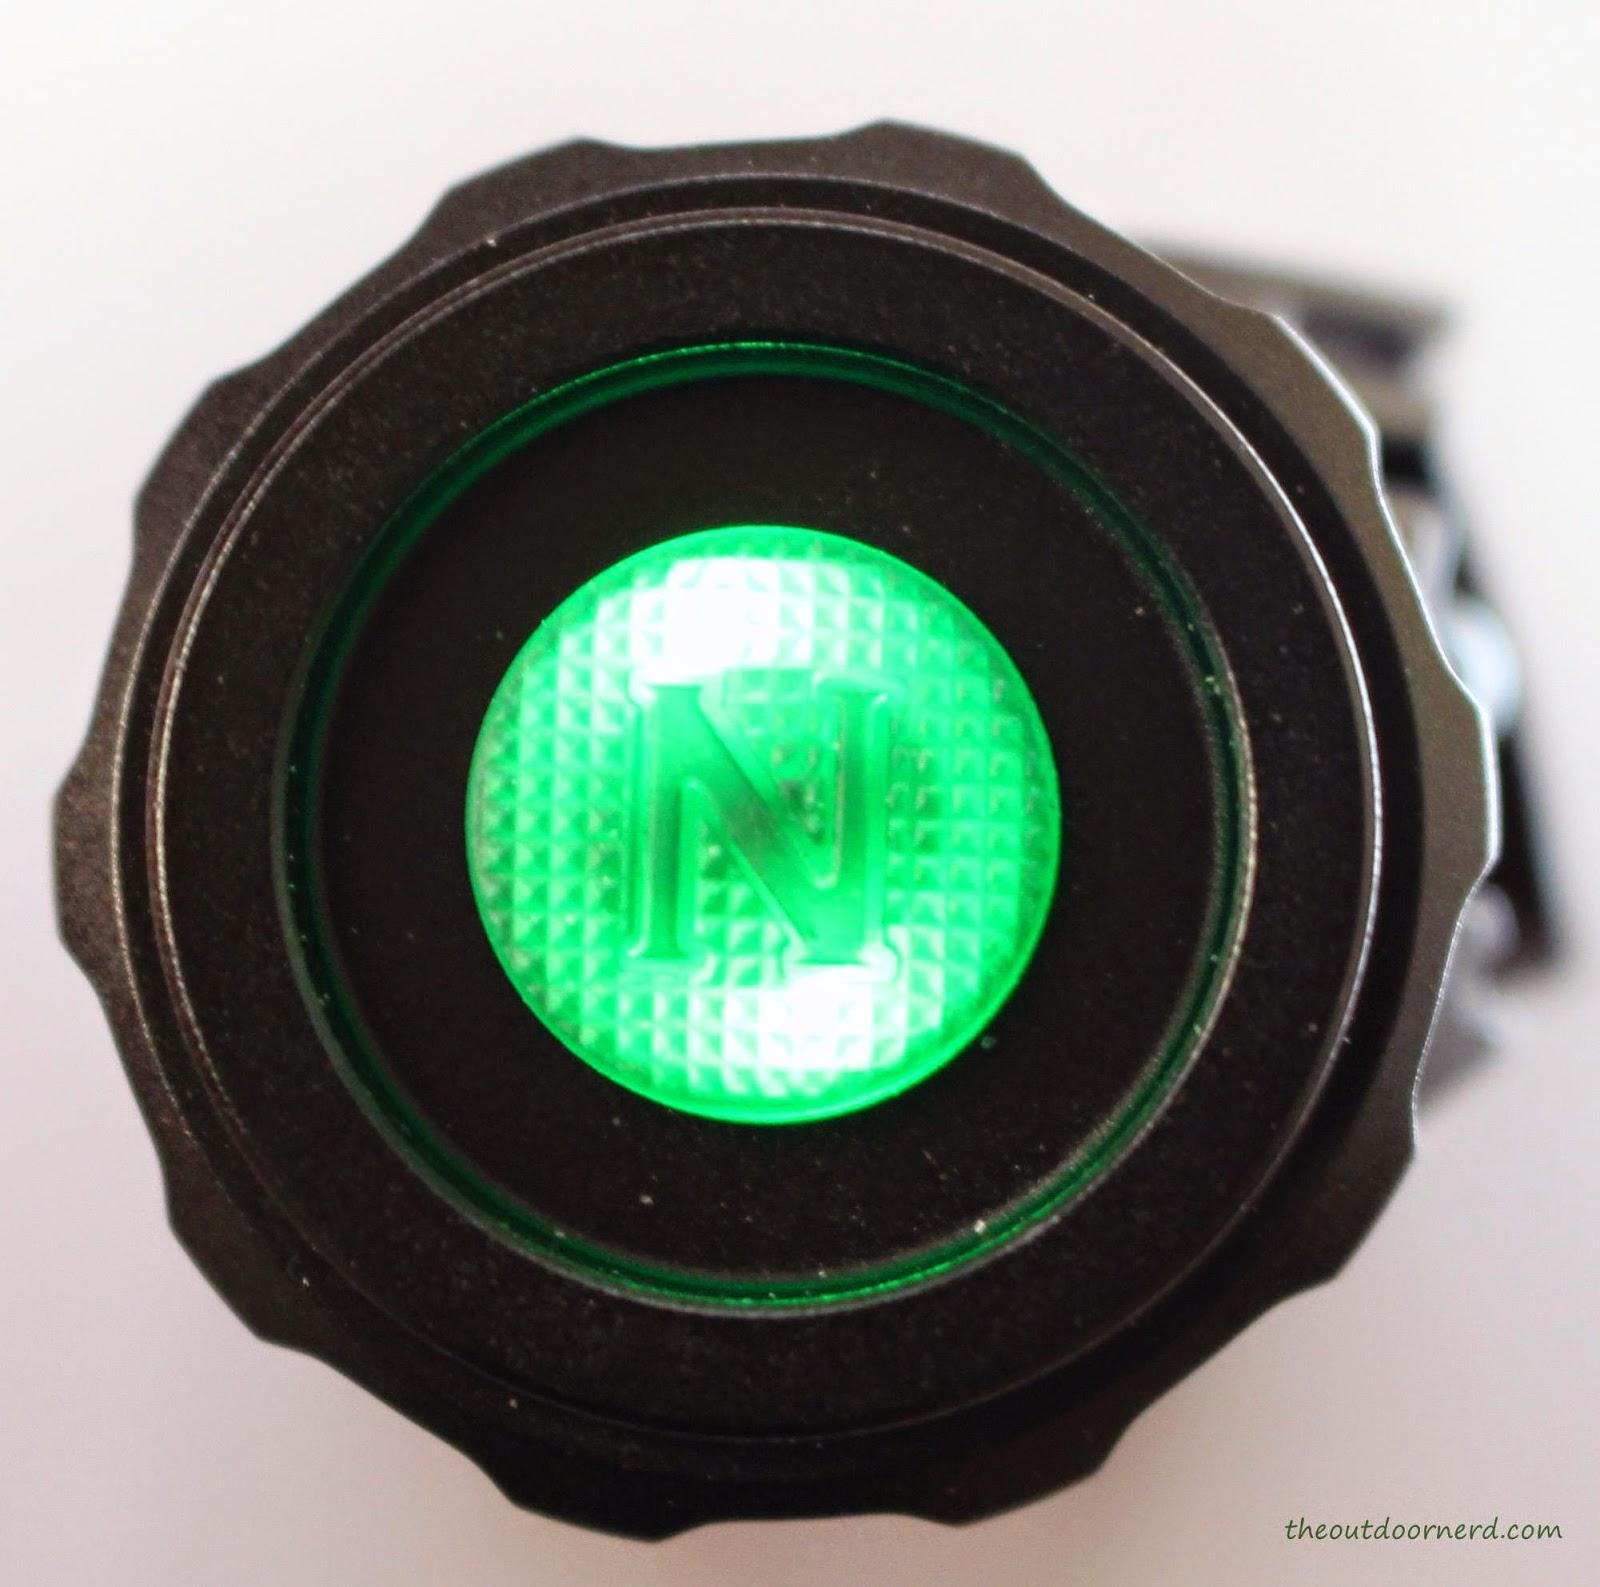 Nitecore HC50 Headlamp Button Lit